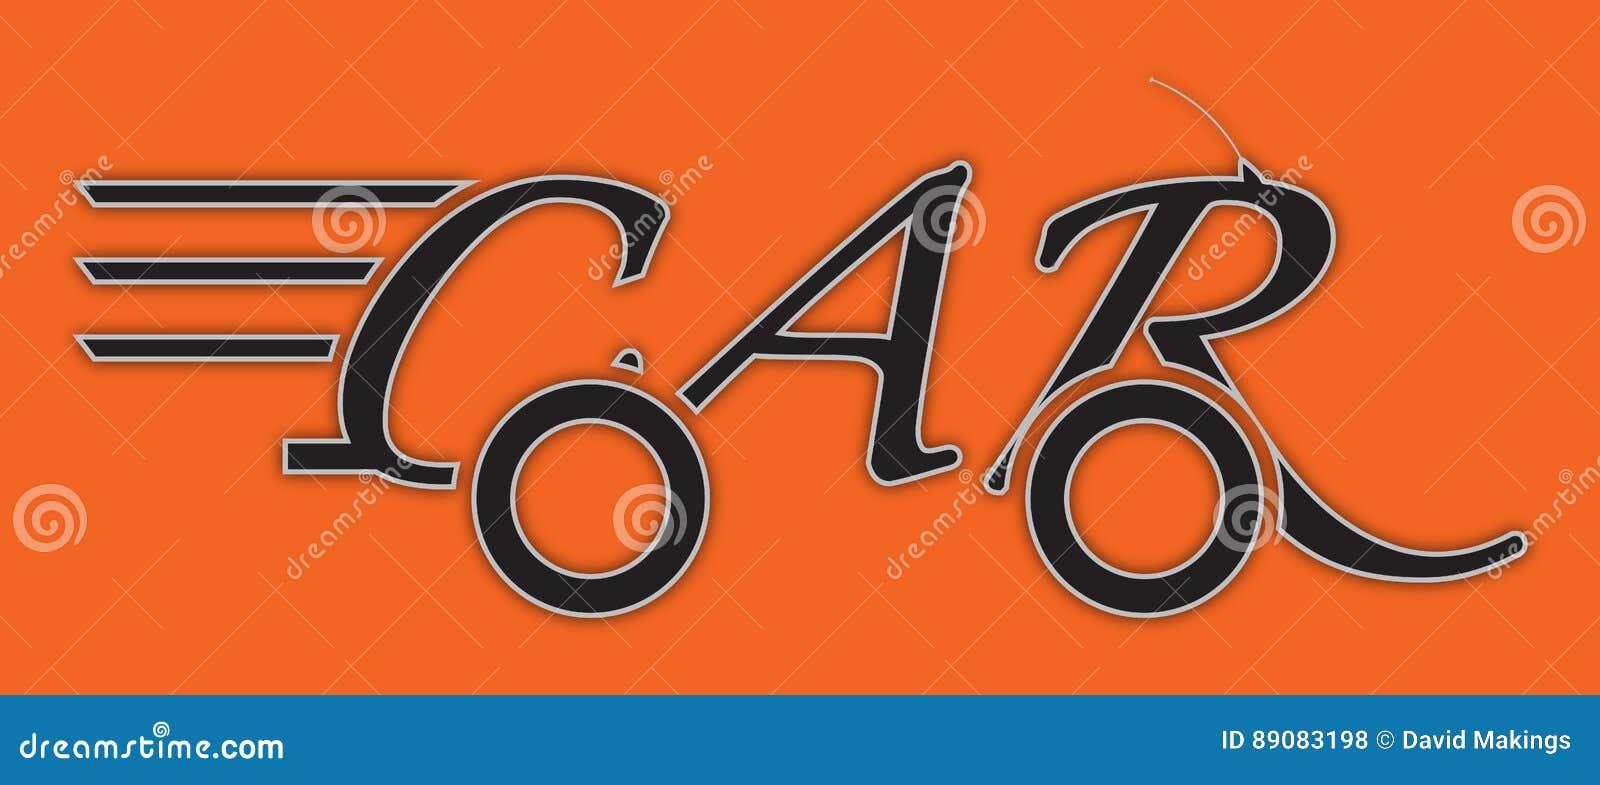 947b50c2b Auto logo black white orange stock illustratie jpg 1300x654 Black white  orange